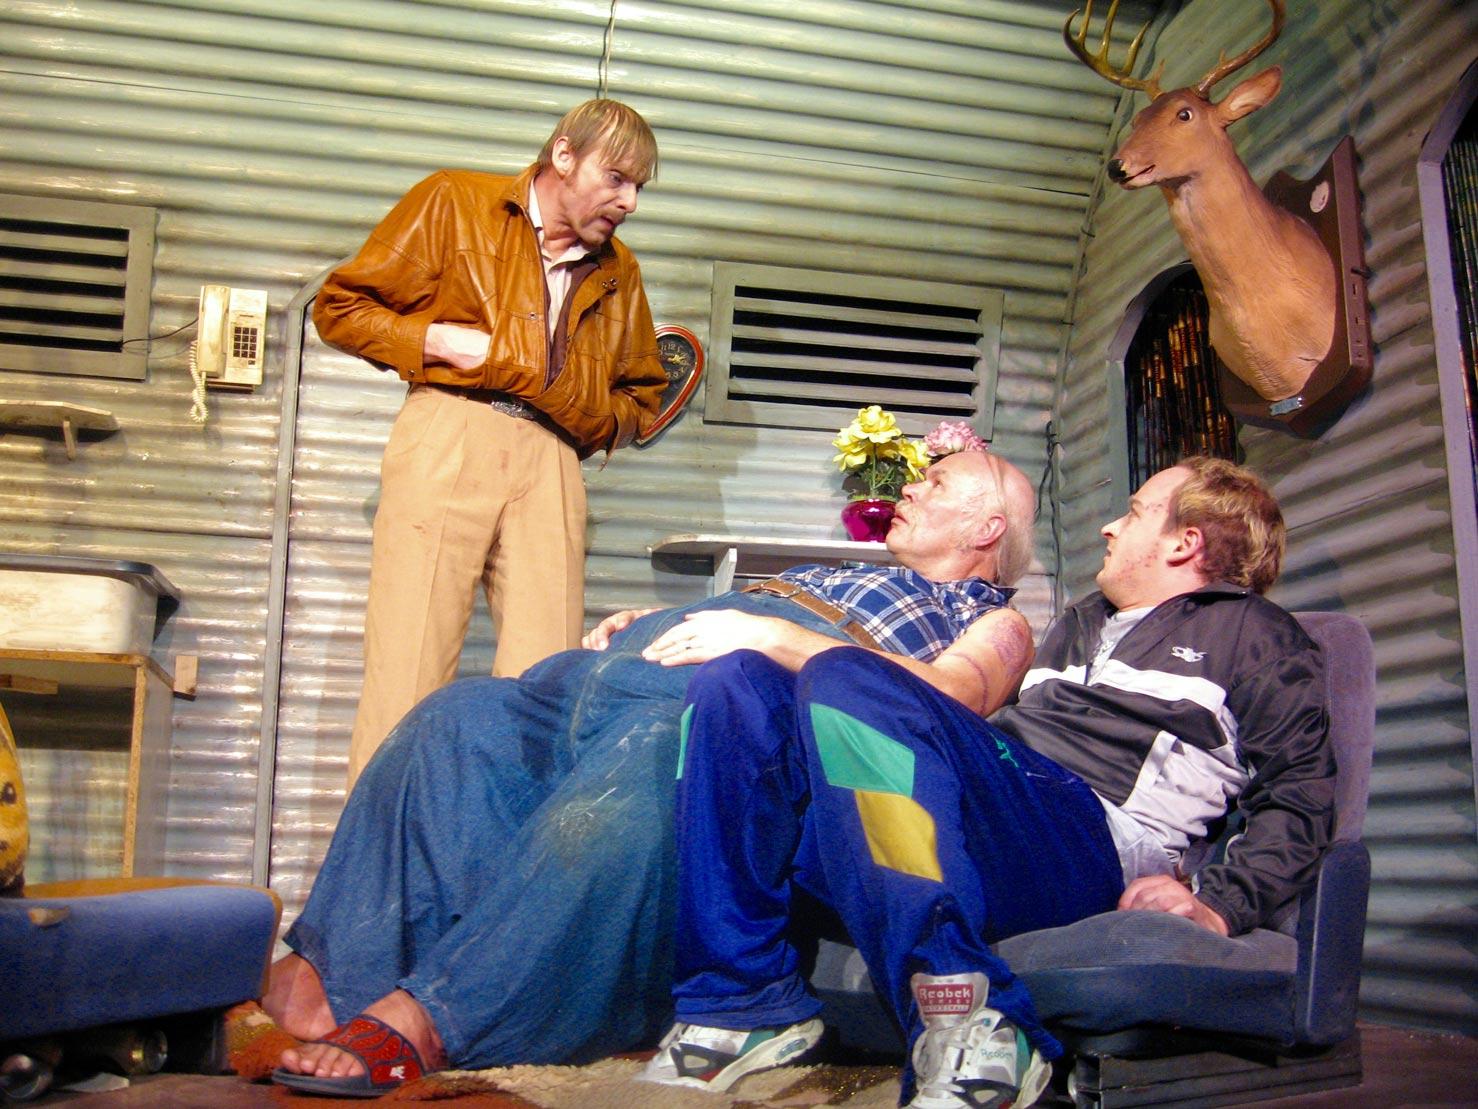 projekttheater---killer-joe---badstuebner-nigsch-pass_pic